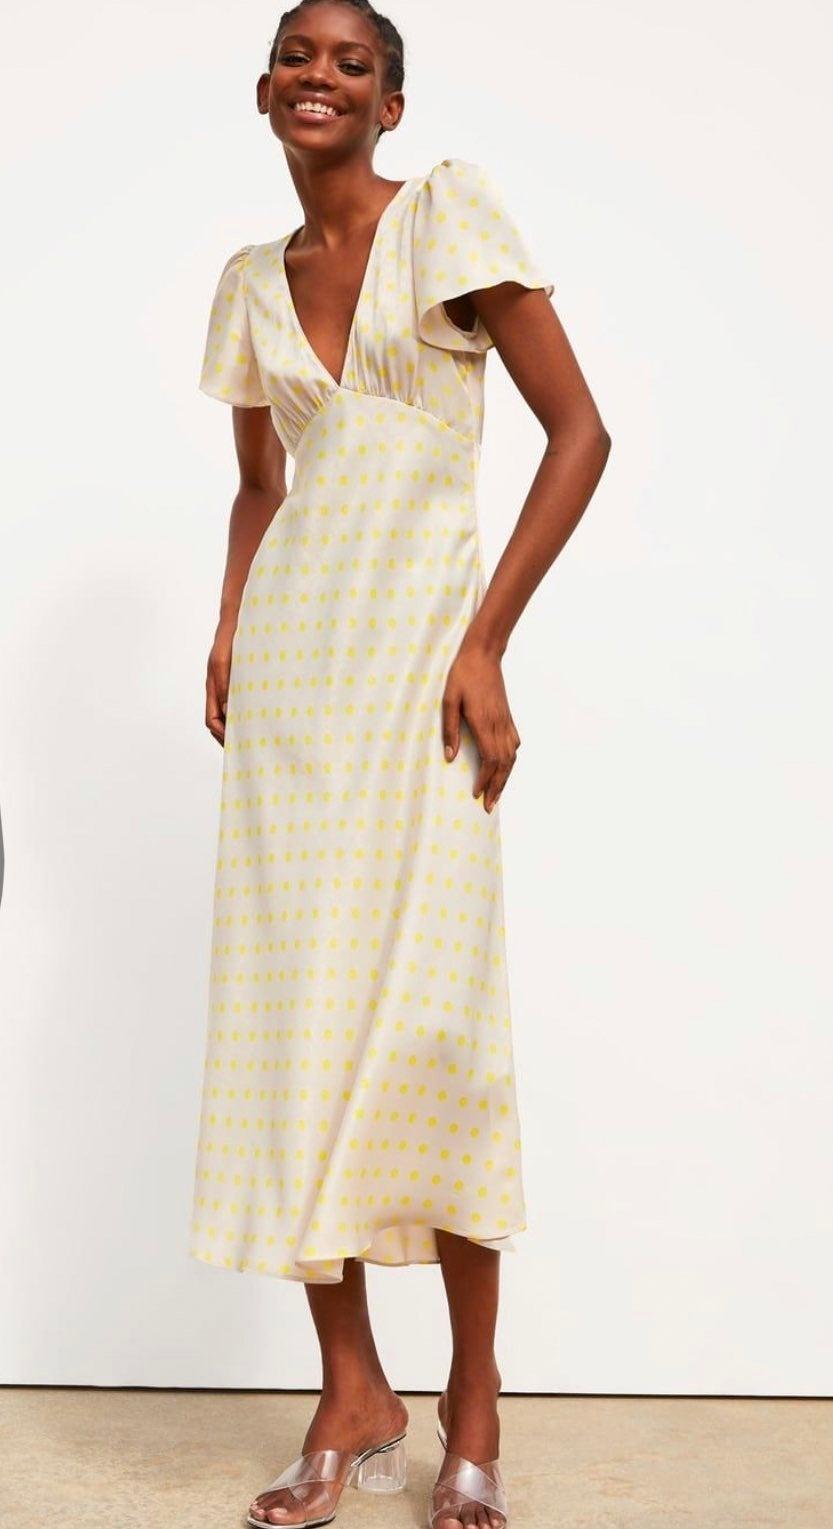 Zara neon pokadot dress